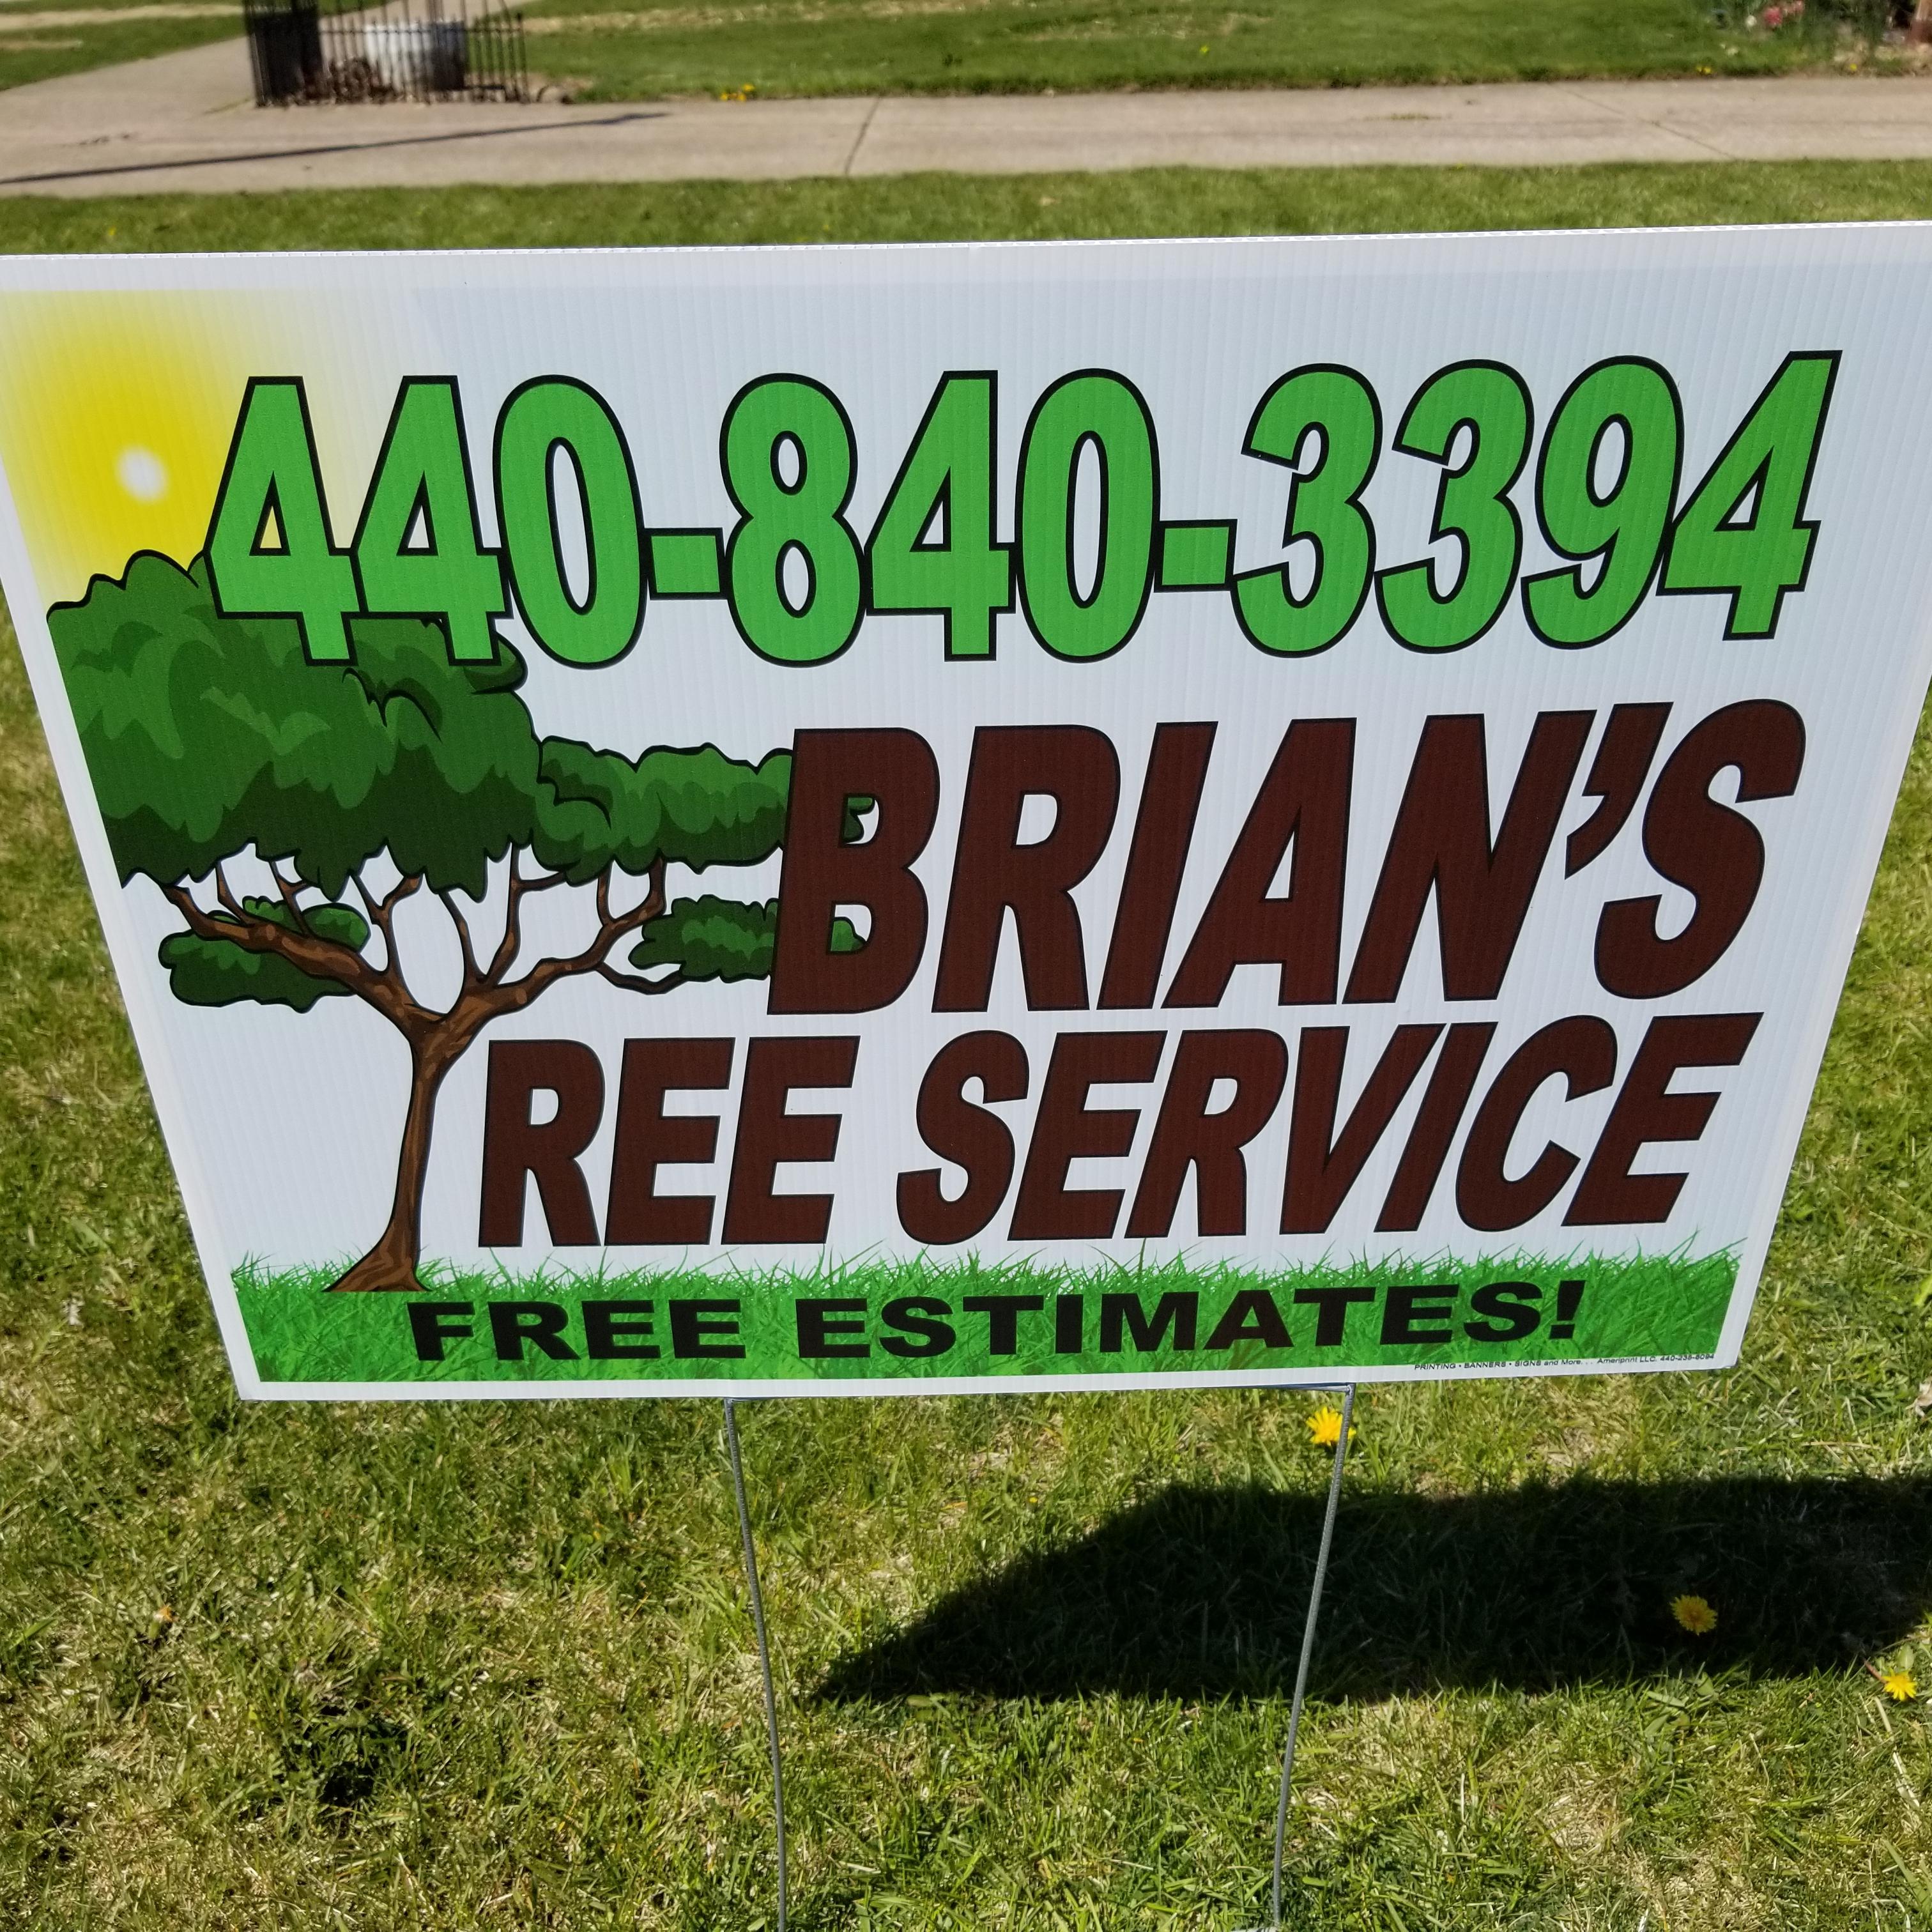 Brian's Tree Service